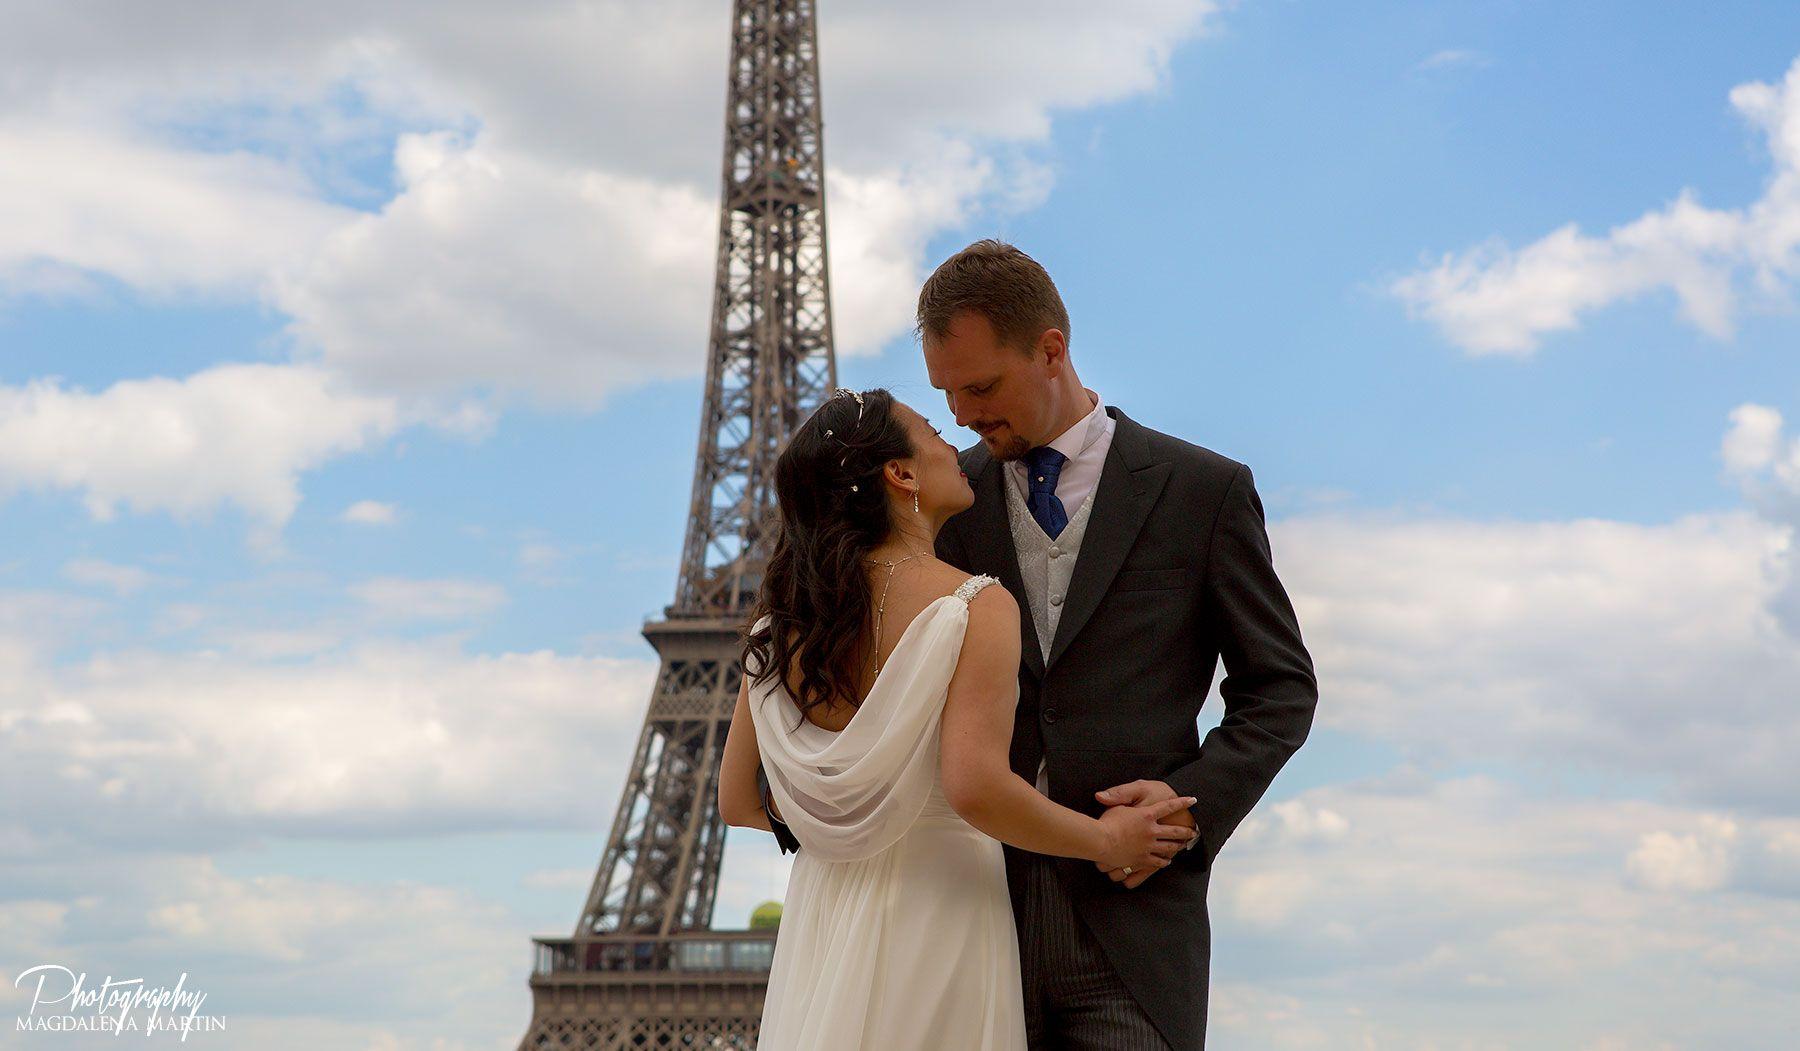 ©Photographer #MagdalenaMartin #MMPhotoart #Paris #romantic #wedding #eiffel #marriage #elopement #eiffeltower #parisphotography #Paris elopement, #Paris elopement, #paris #wedding #elopement, #marriage in paris, #photographer in Paris, #weddinginParis, #Frenchweddings